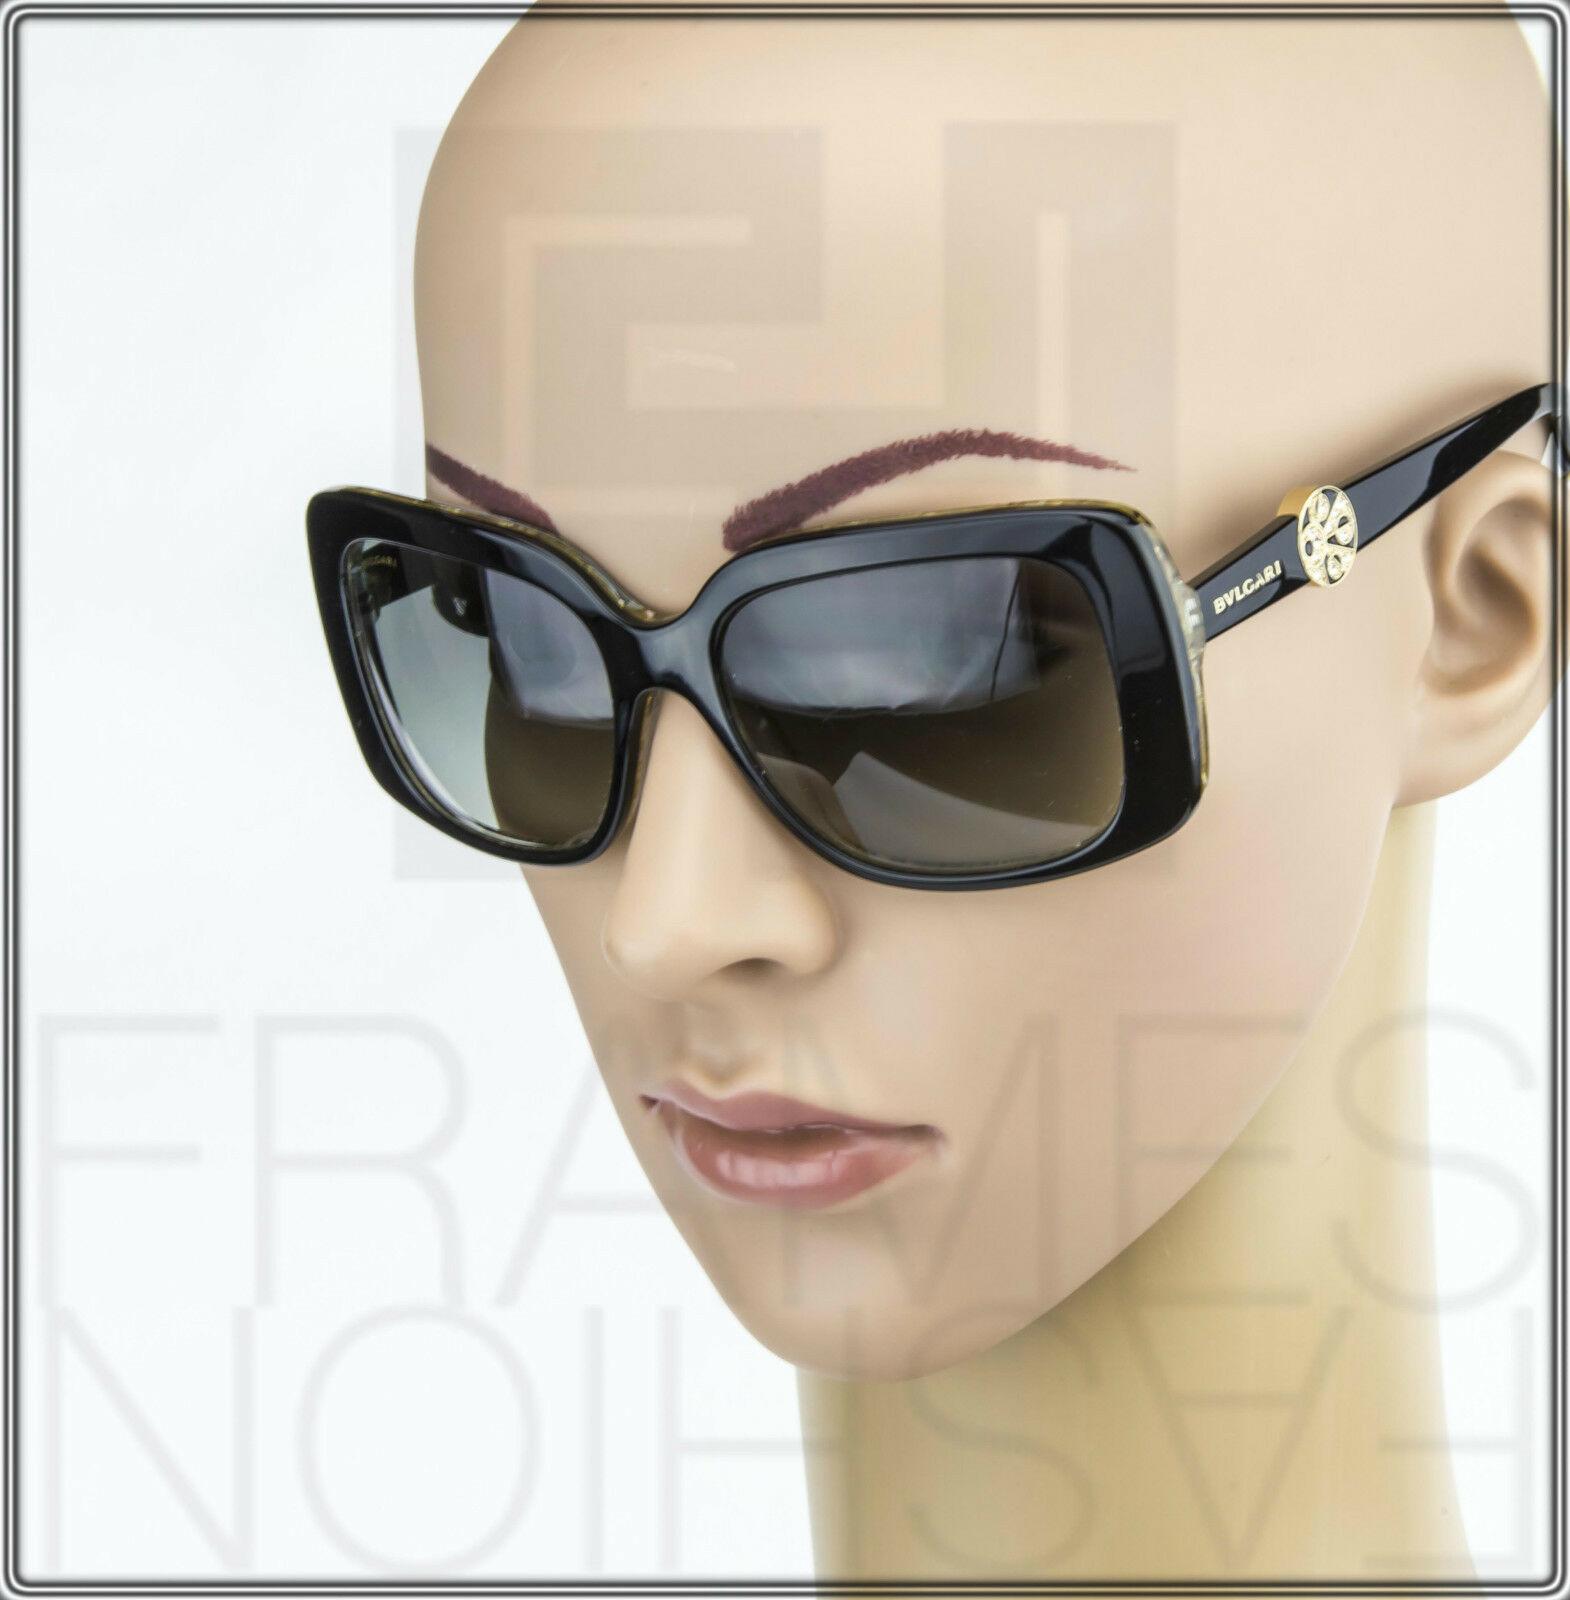 BVLGARI INTARSIO 8146B 5325/11 Black Gold Sunglasses 8146 Square Women Gradient image 2